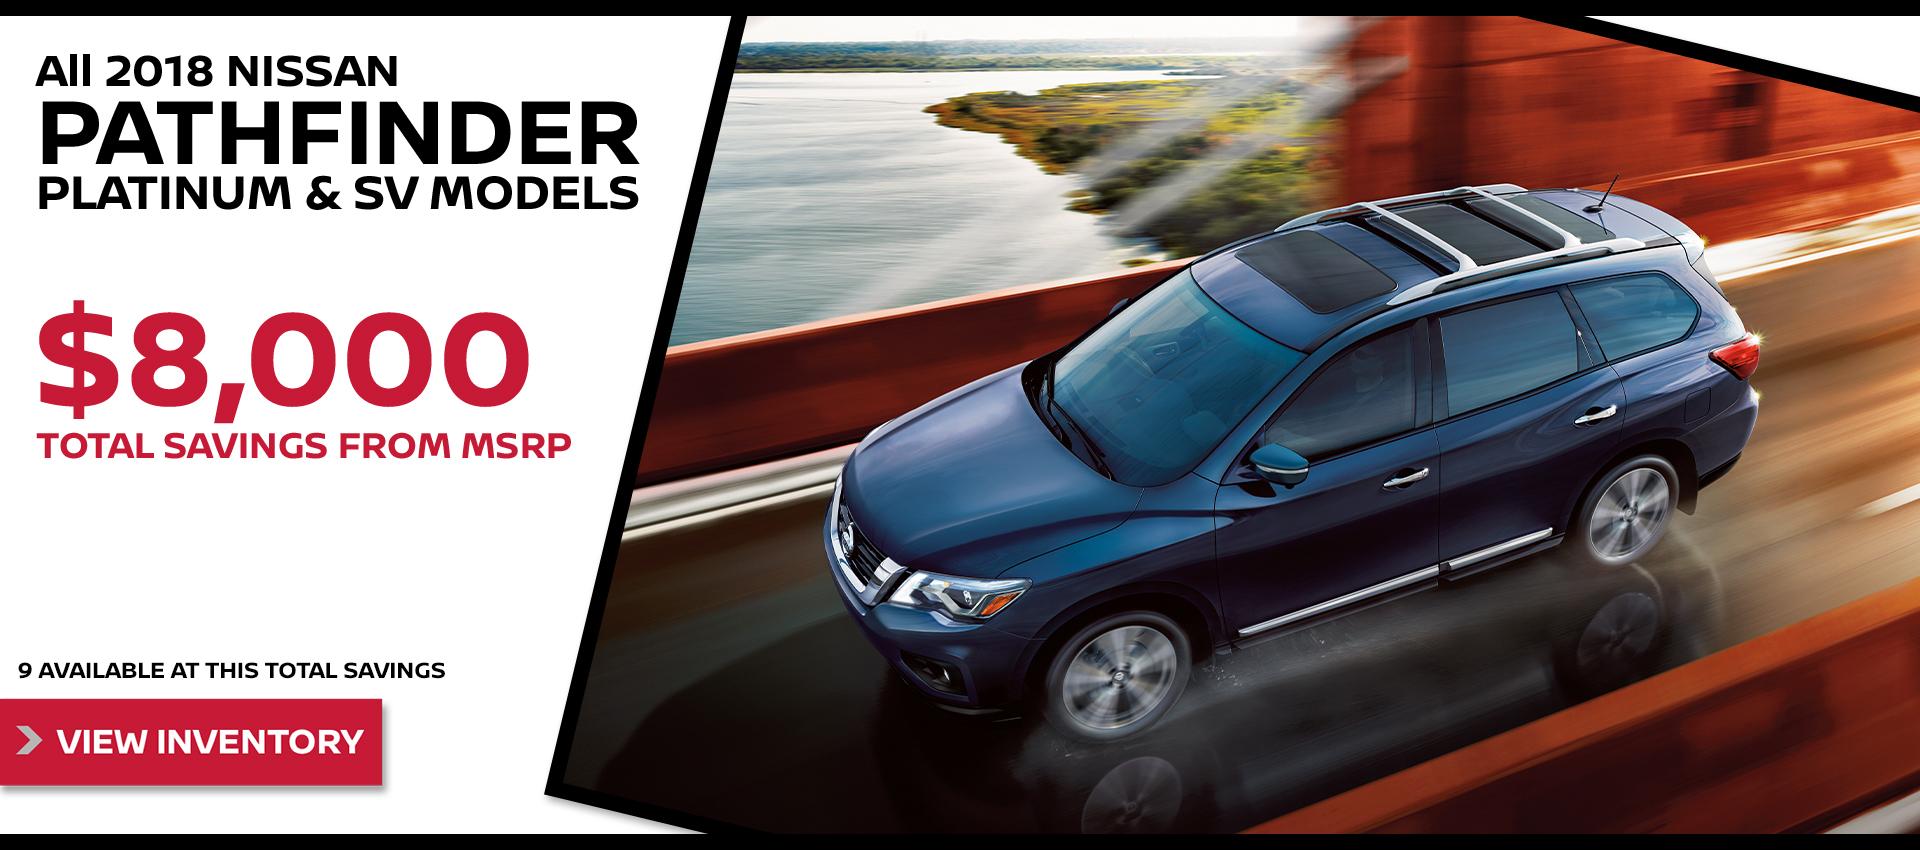 Mossy Nissan - Nissan Pathfinder $8,000 Off MSRP HP